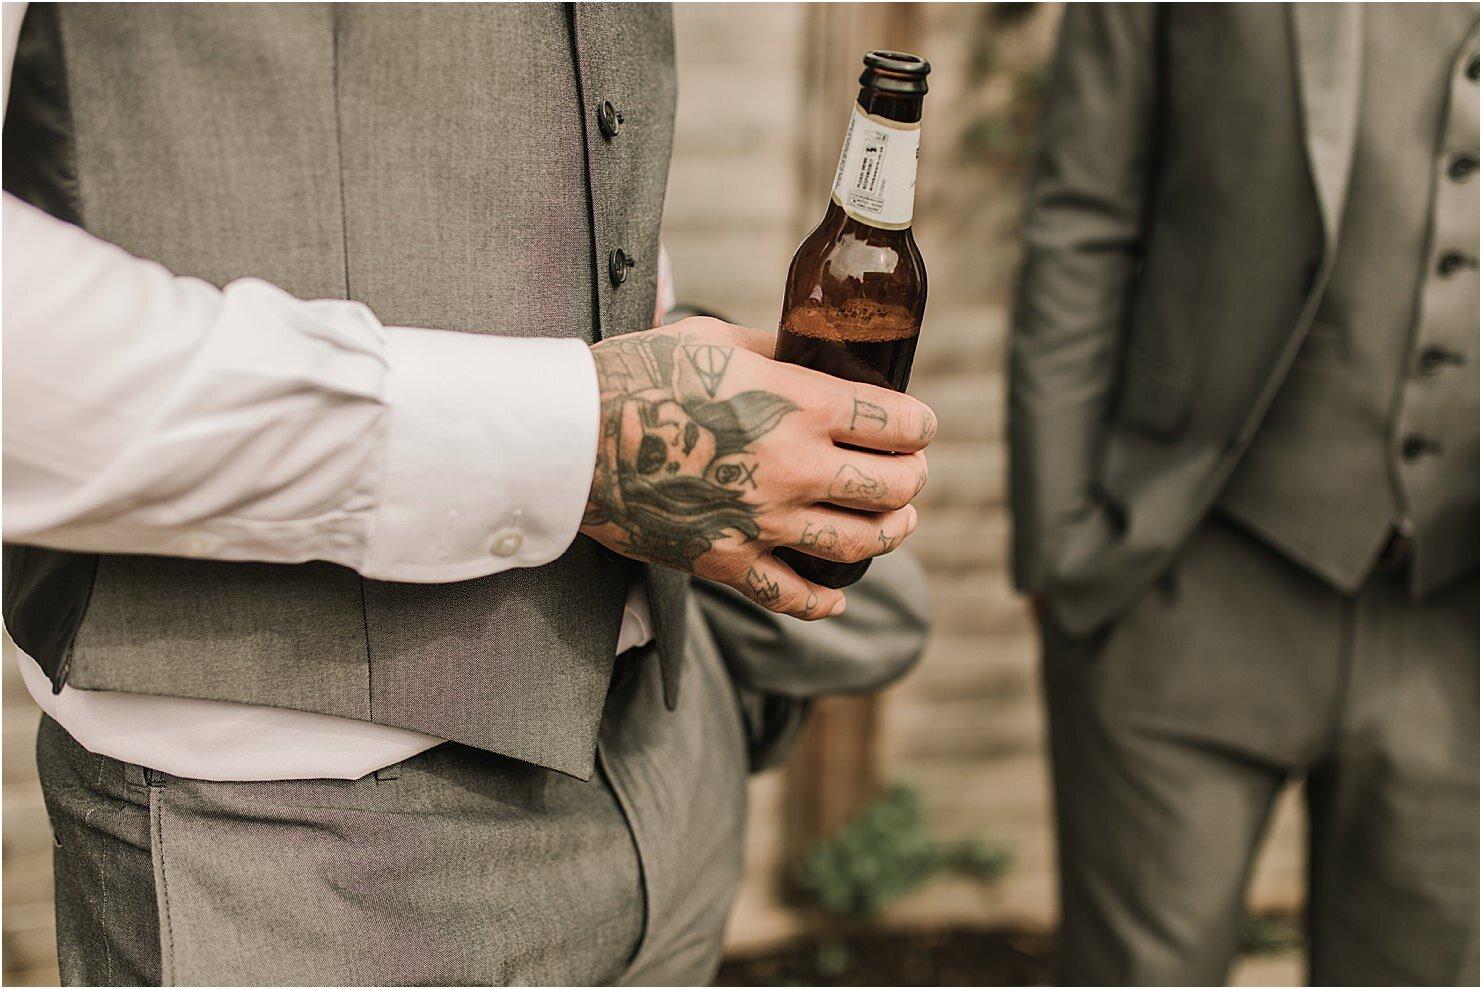 boda-de-cuento-en-castillo-boda-en-londres-14.jpg